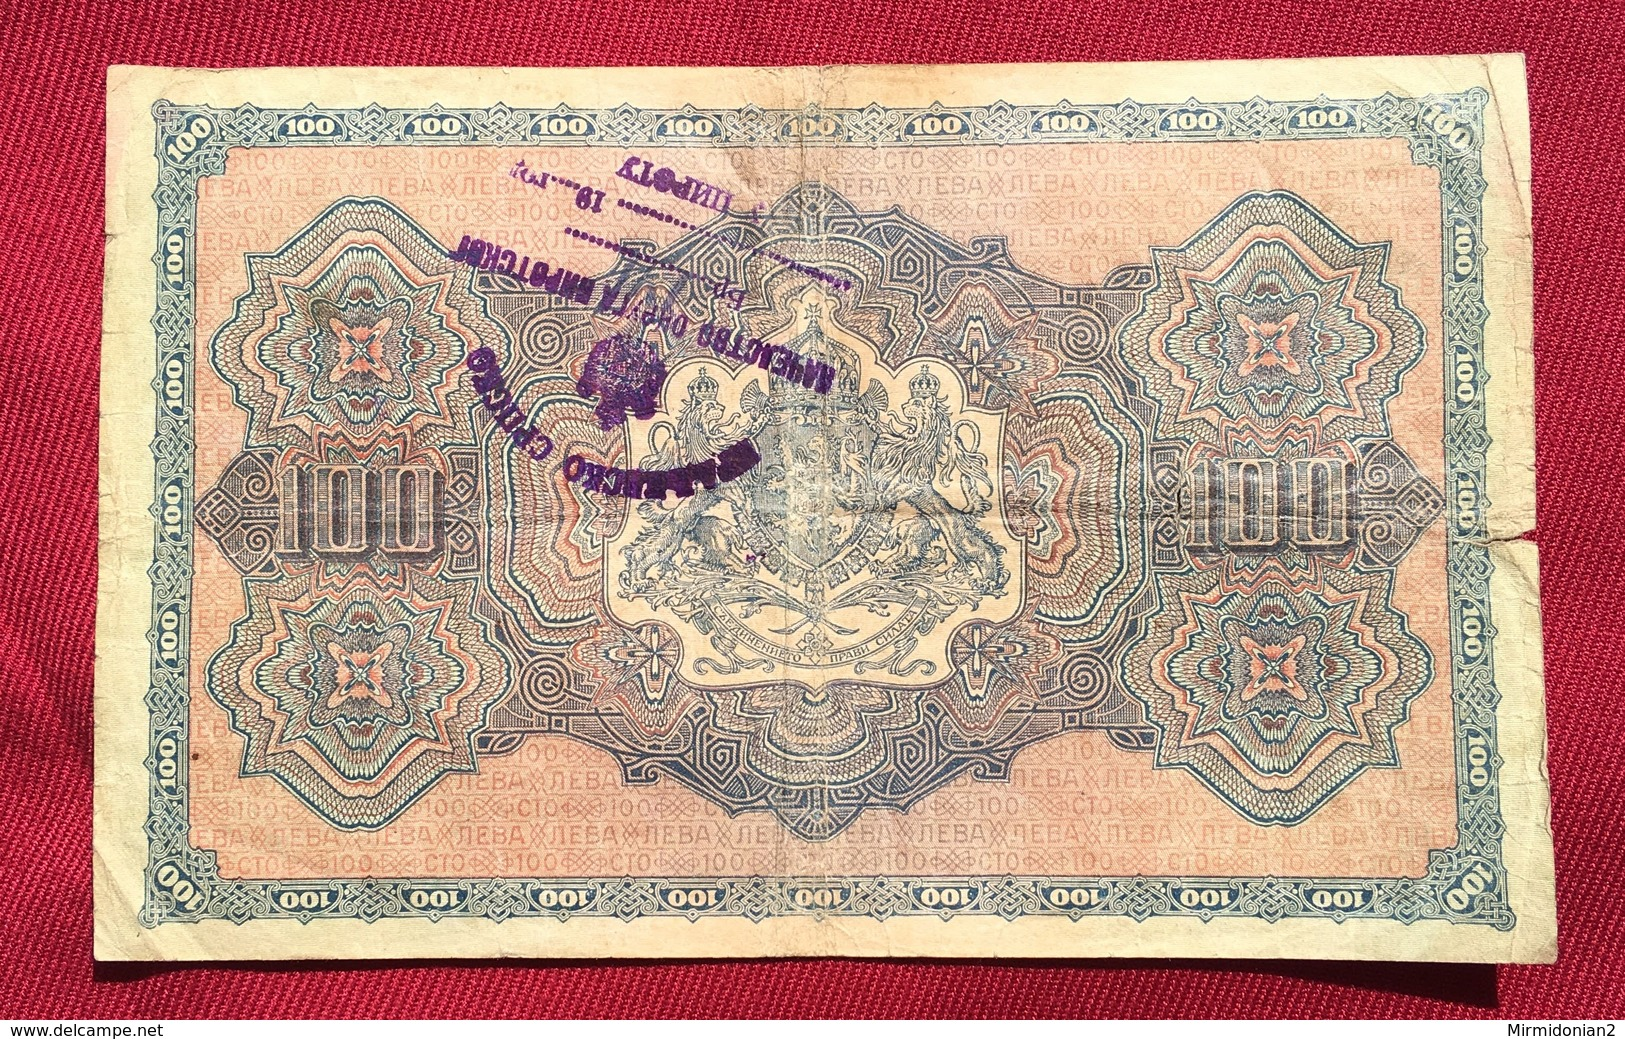 SERBIA - BULGARIA 100 LEVA SREBRO,ND 1918. WITH SERBIAN SEAL PIROT, VERY RARE, GOOD QUALITY (NACELSTVO OKRUGA PIROTSKOG) - Bulgaria